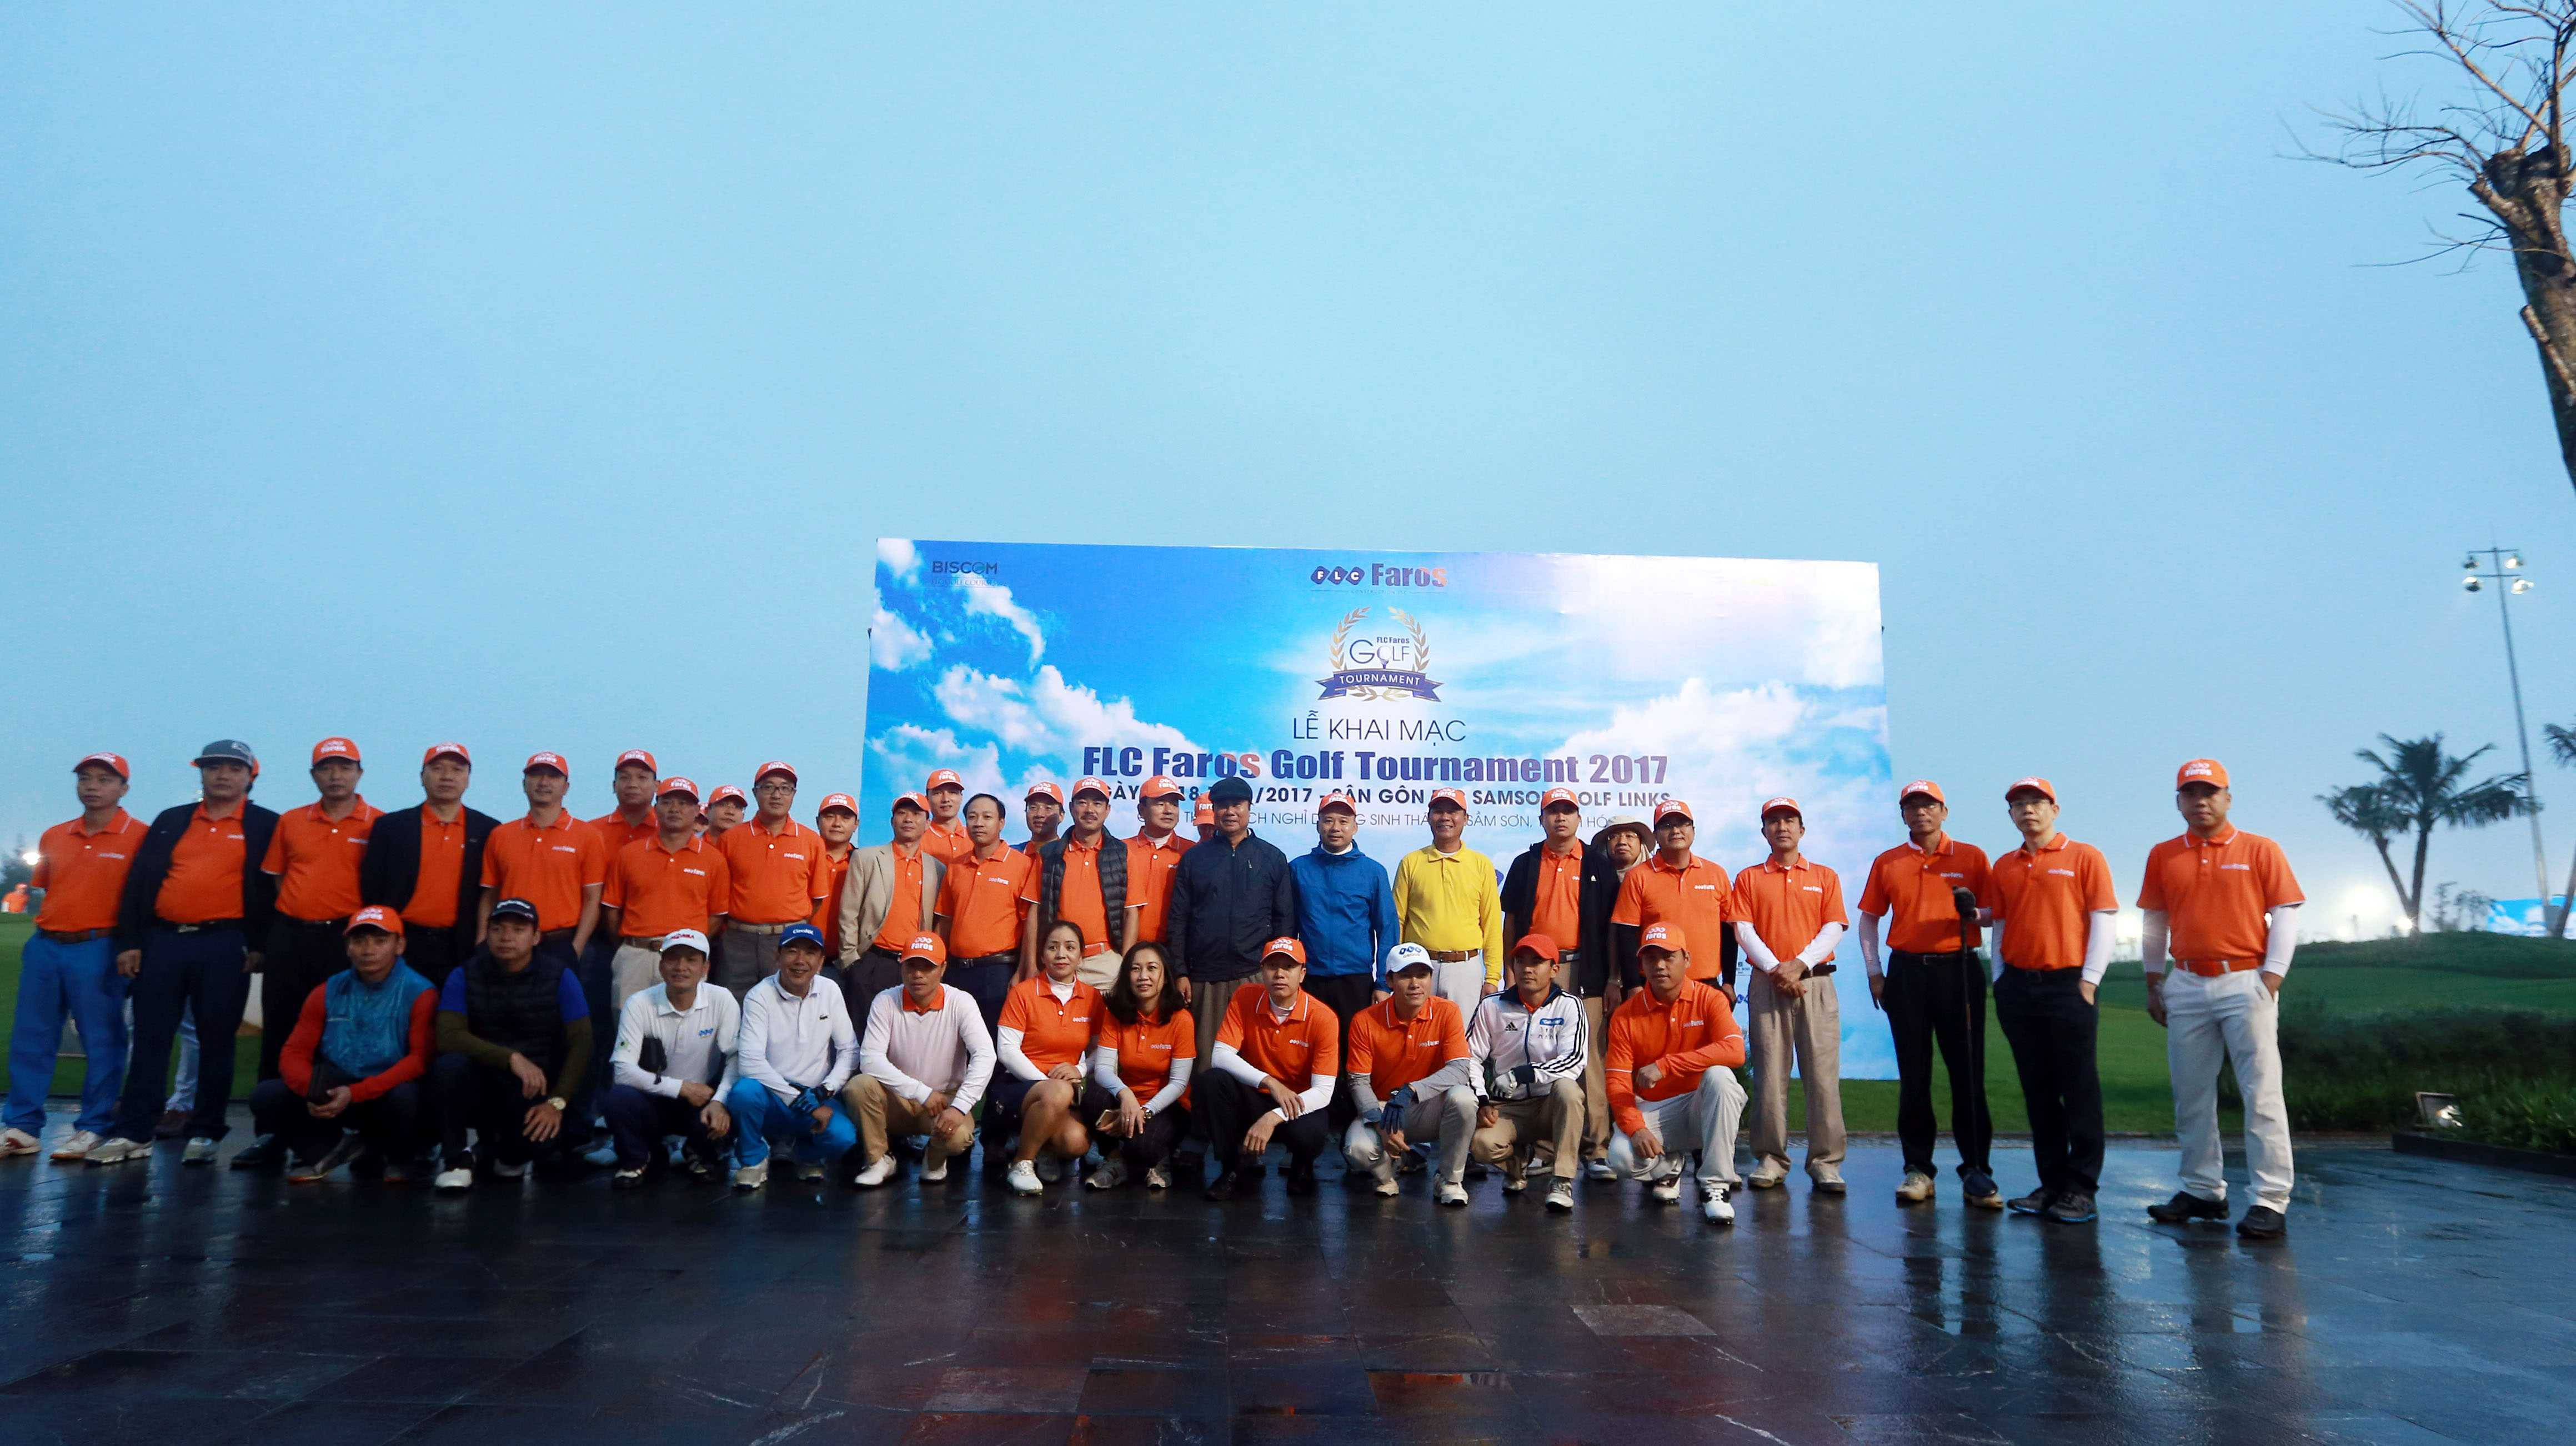 Hon 1200 golfer tranh tai tai FLC Faros Golf Tournament 2017 hinh anh 5